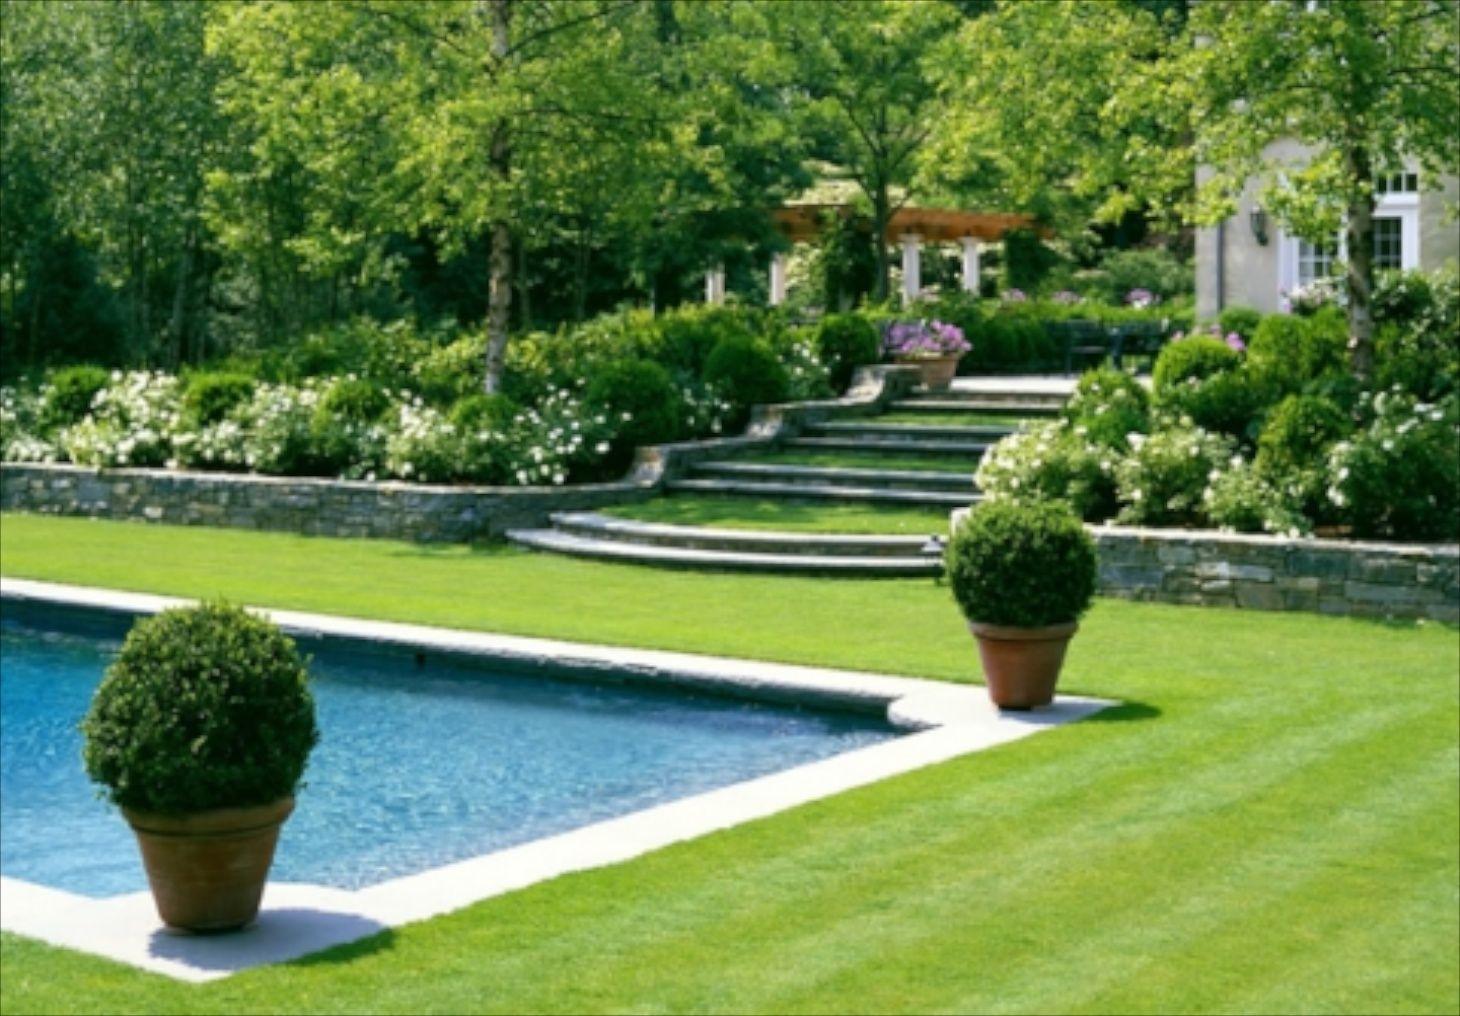 Garden Paths Pool Landscaping Garden Pool Backyard Pool